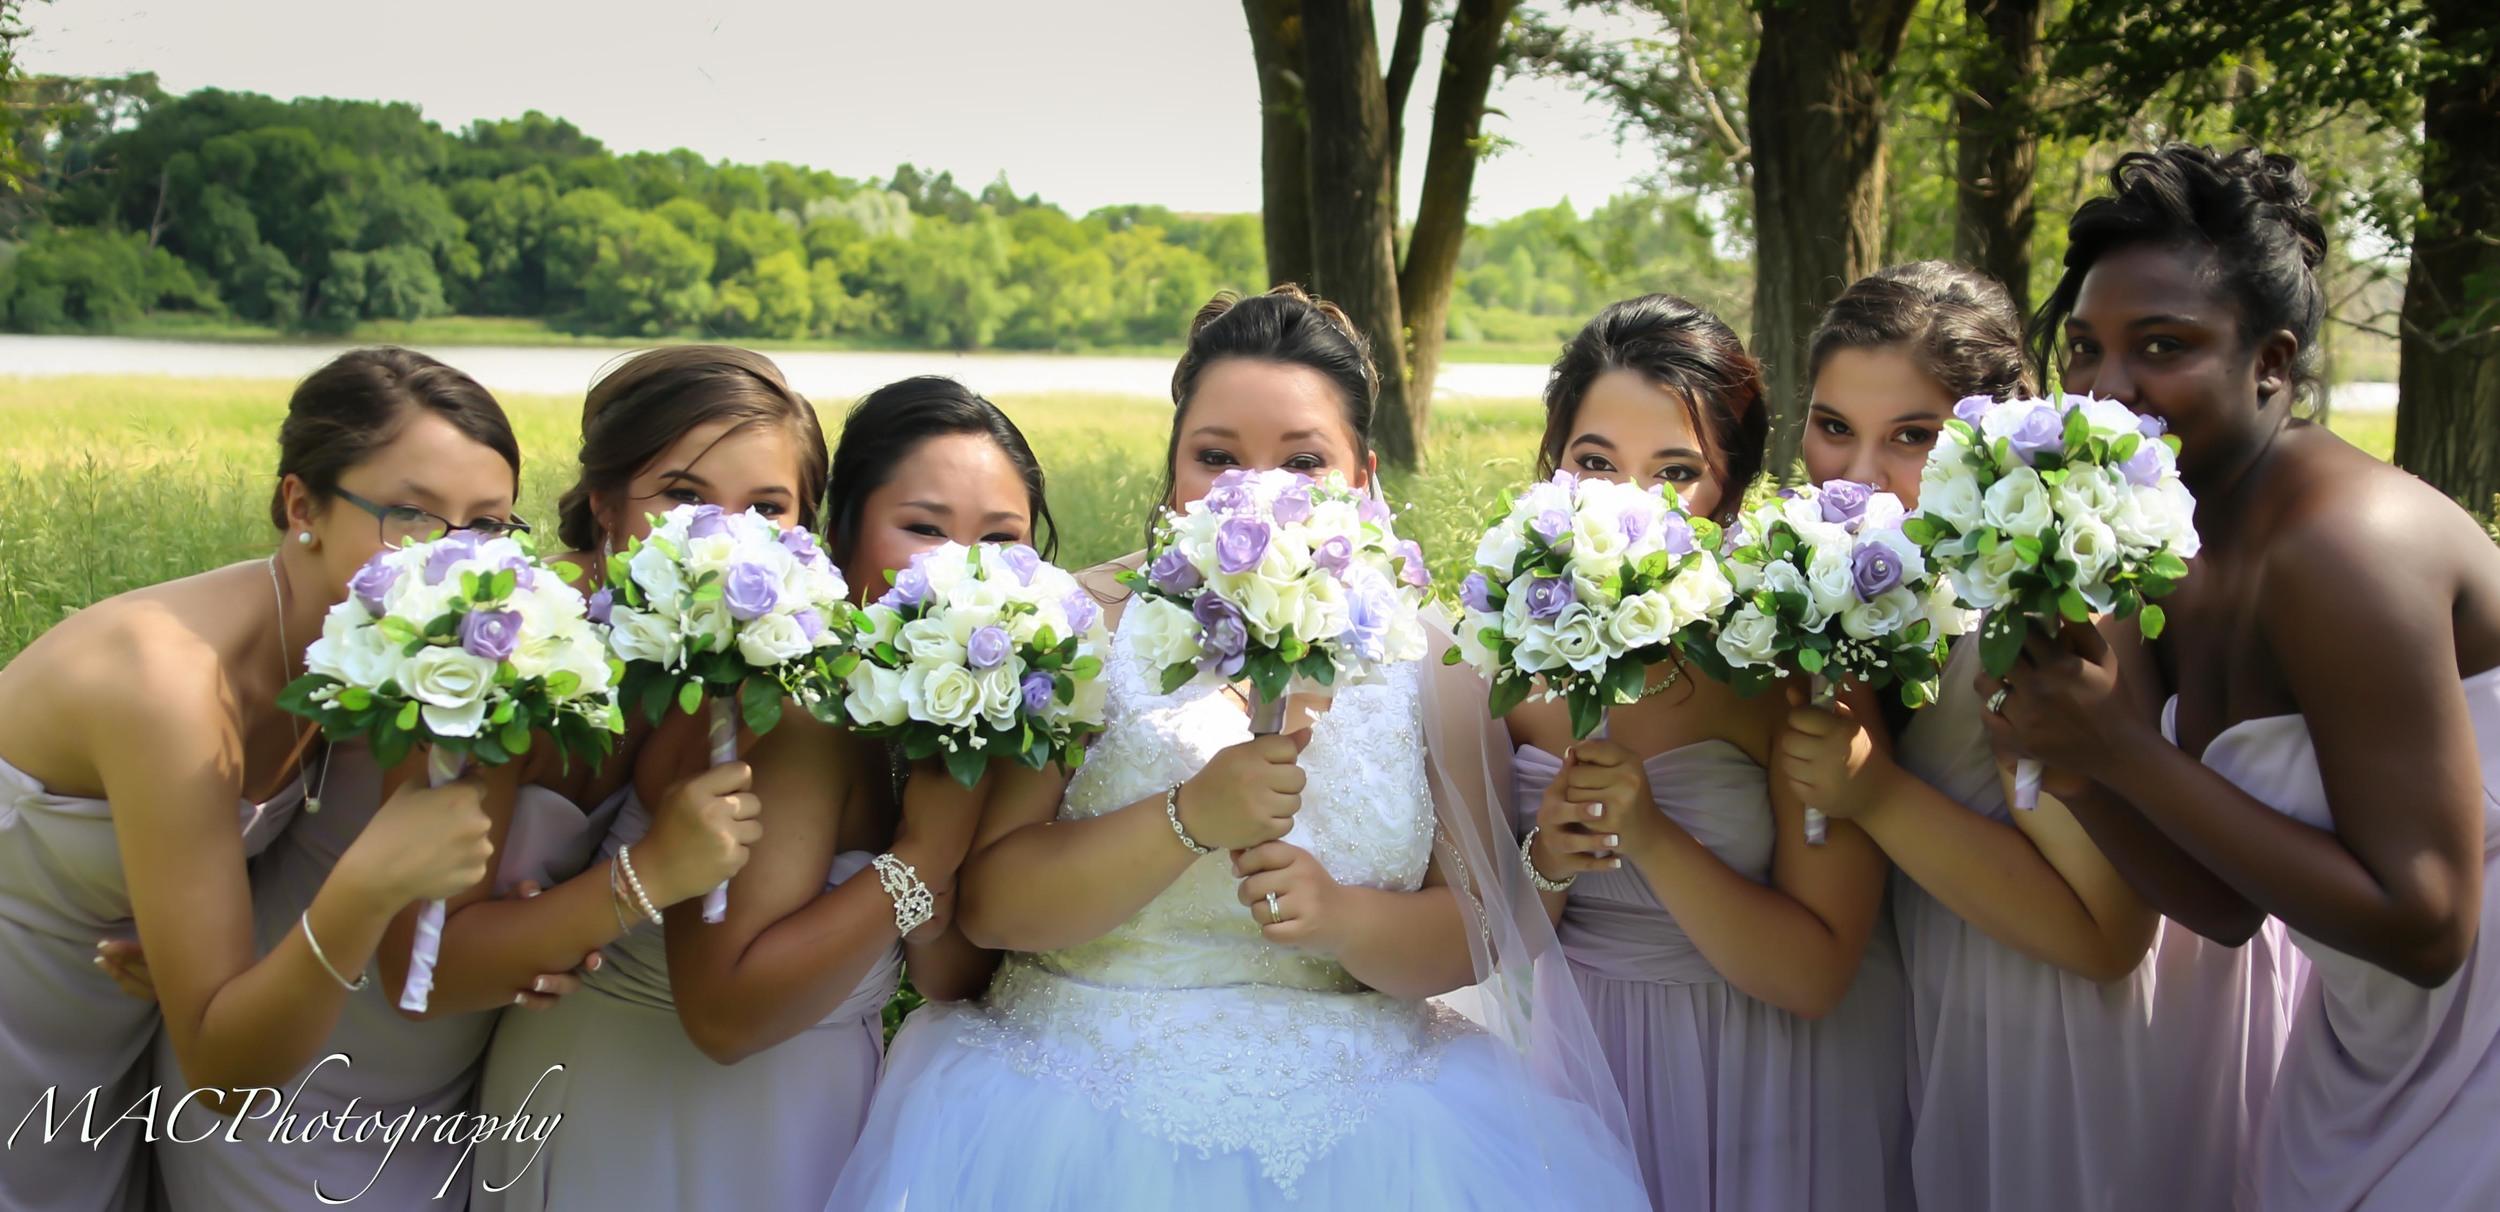 Chacon wedding--17.jpg